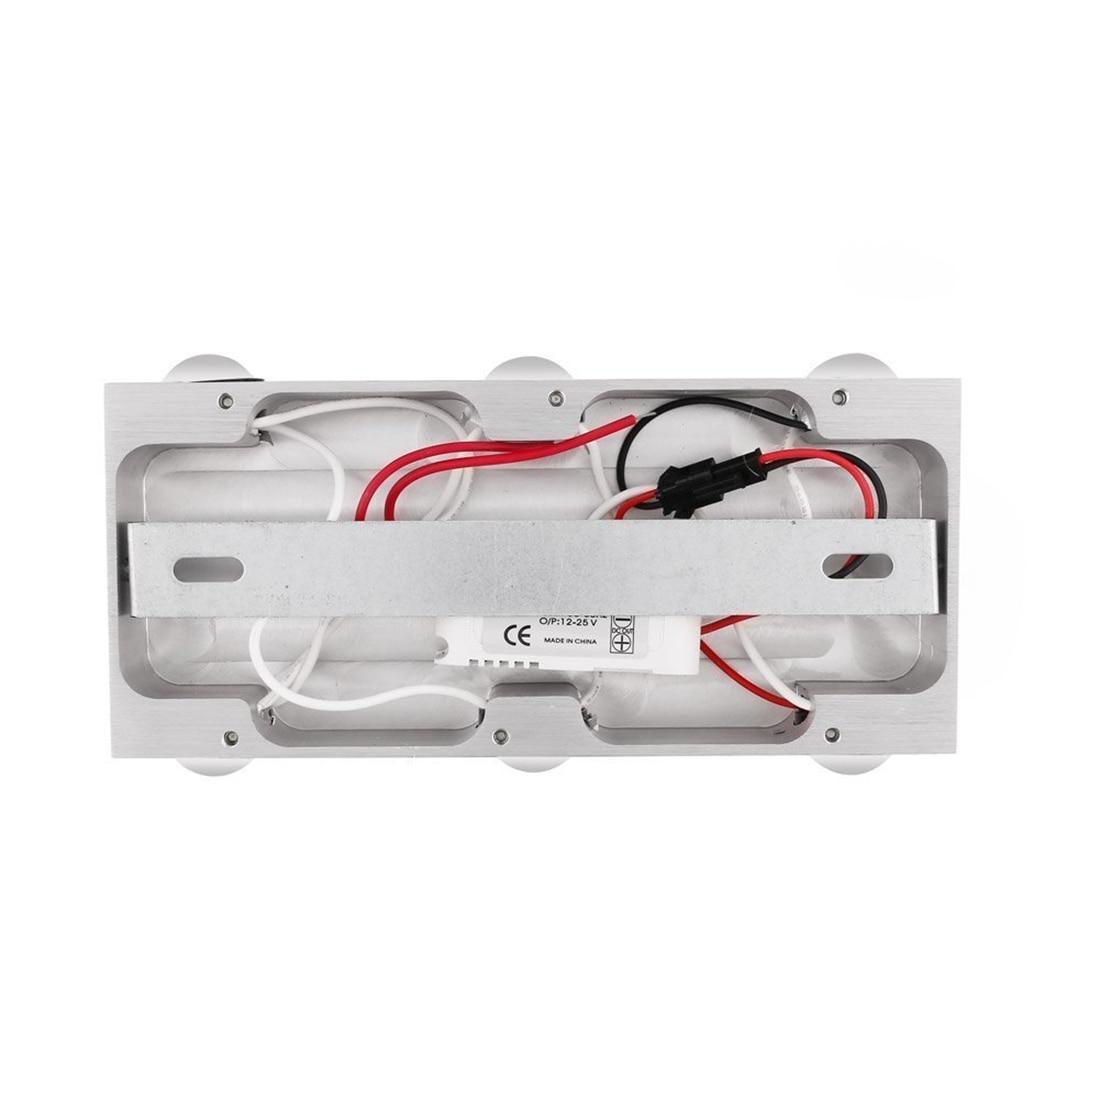 LED wall light 18 W 6000 Kelvin, cool white or warm white